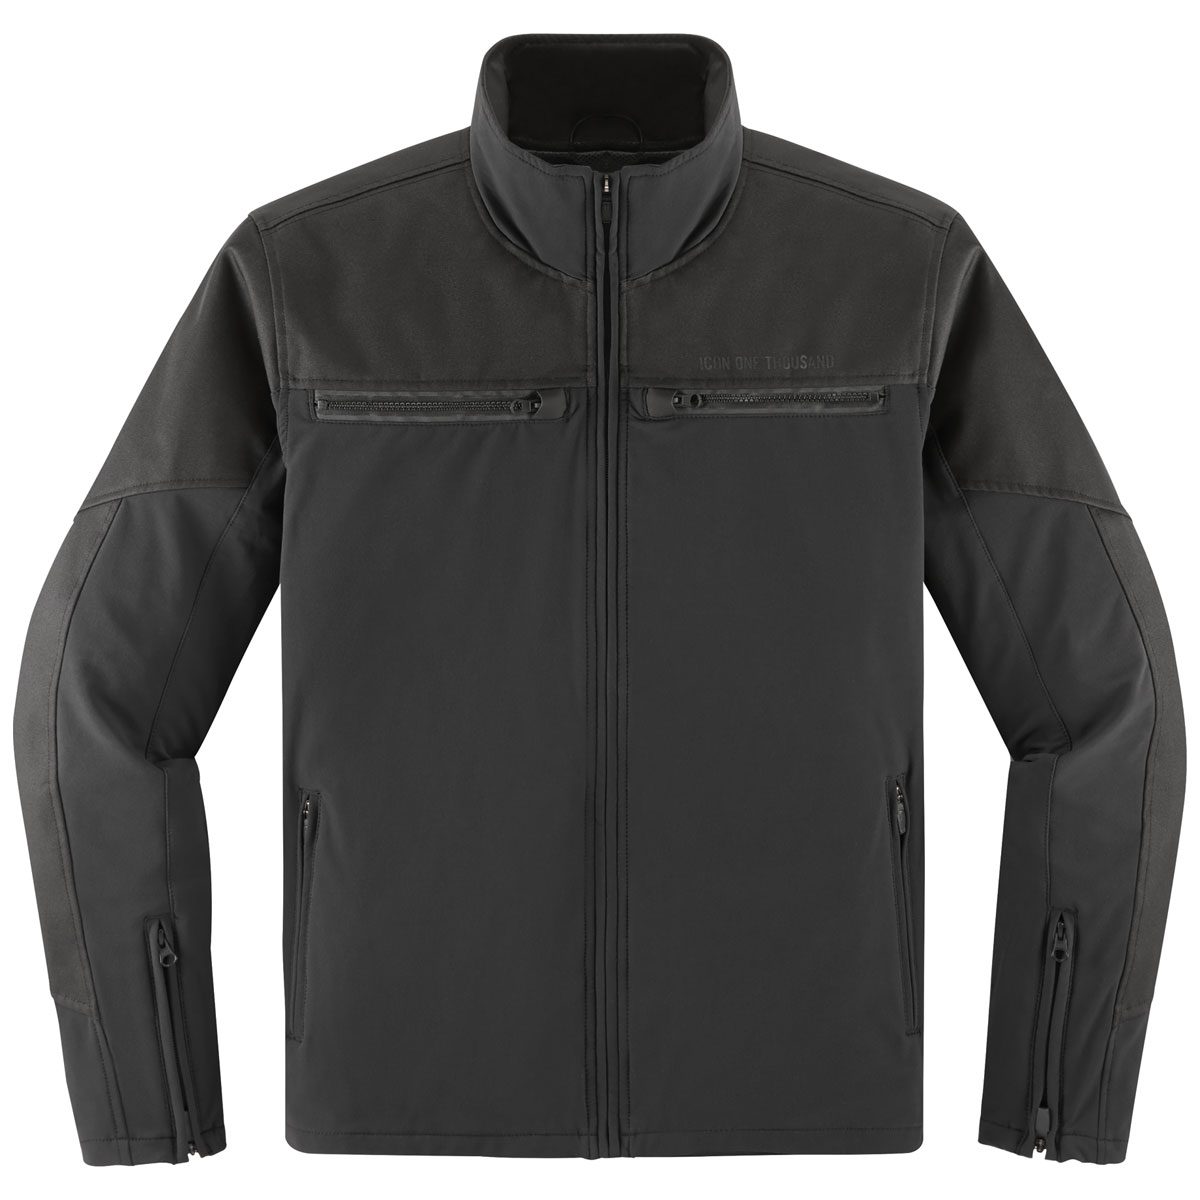 ICON One Thousand Men's Nightbreed Black Jacket